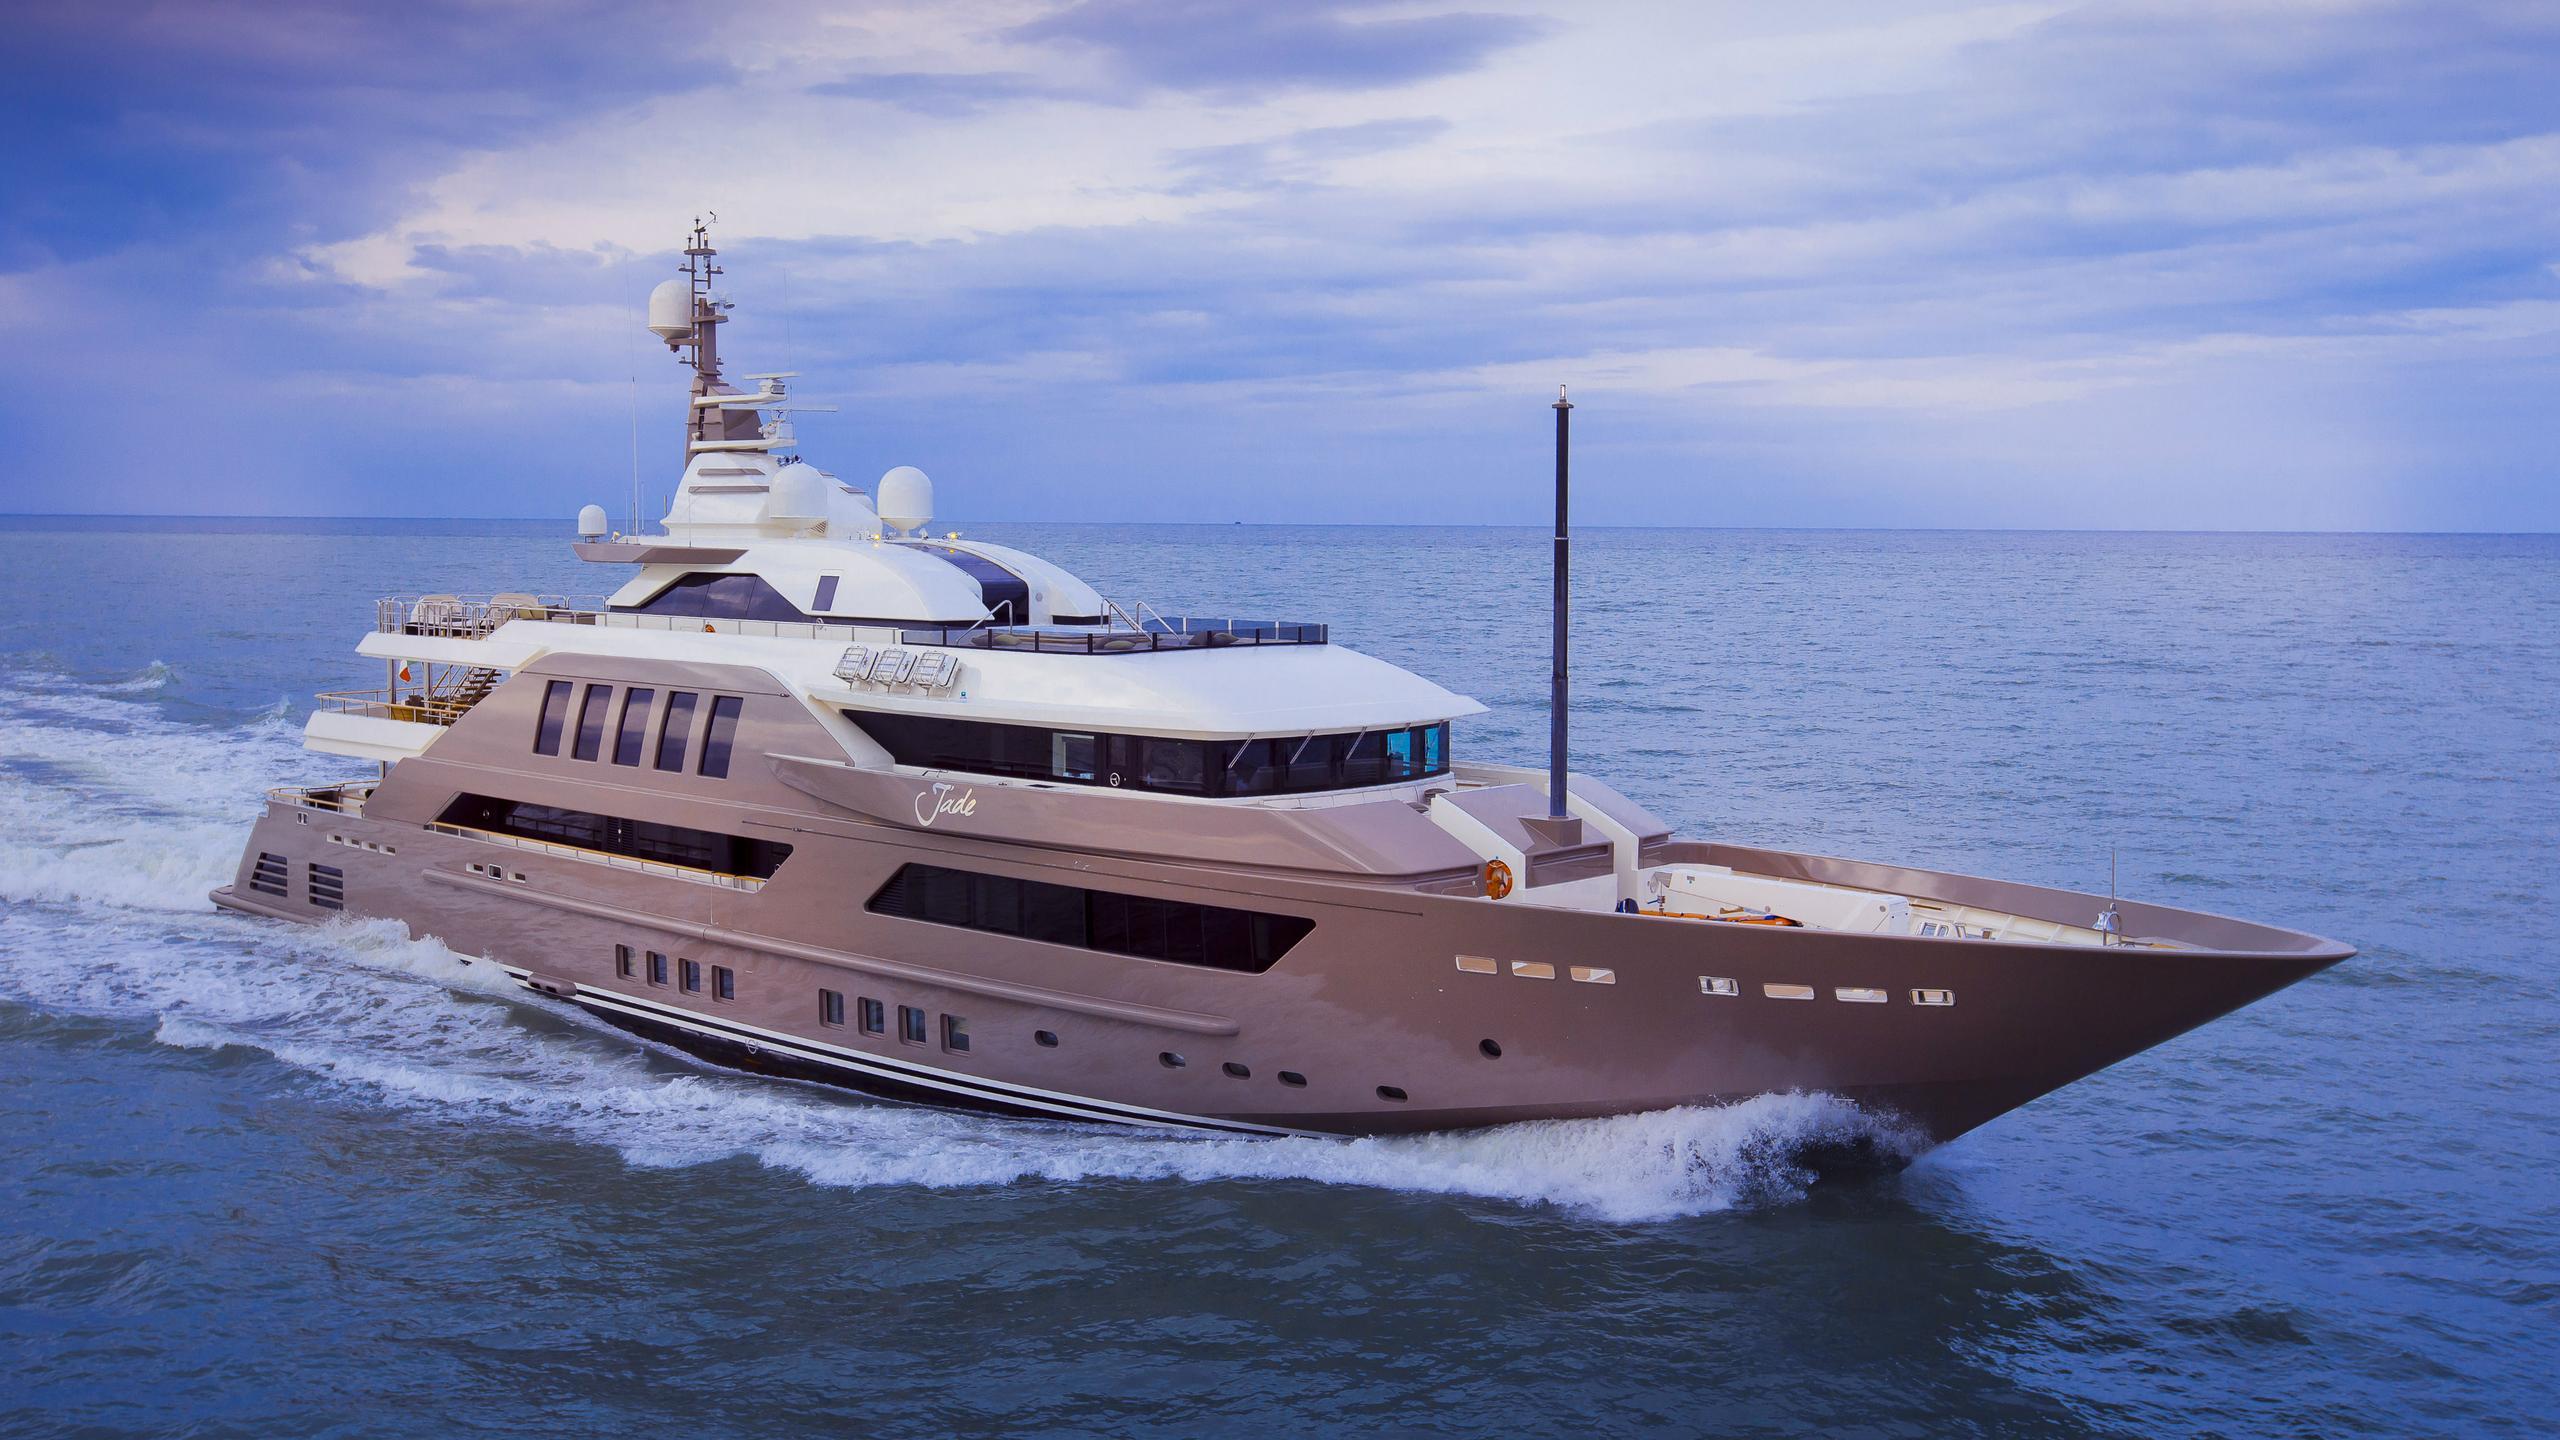 j-ade-motor-yacht-crn-2013-58m-cruising